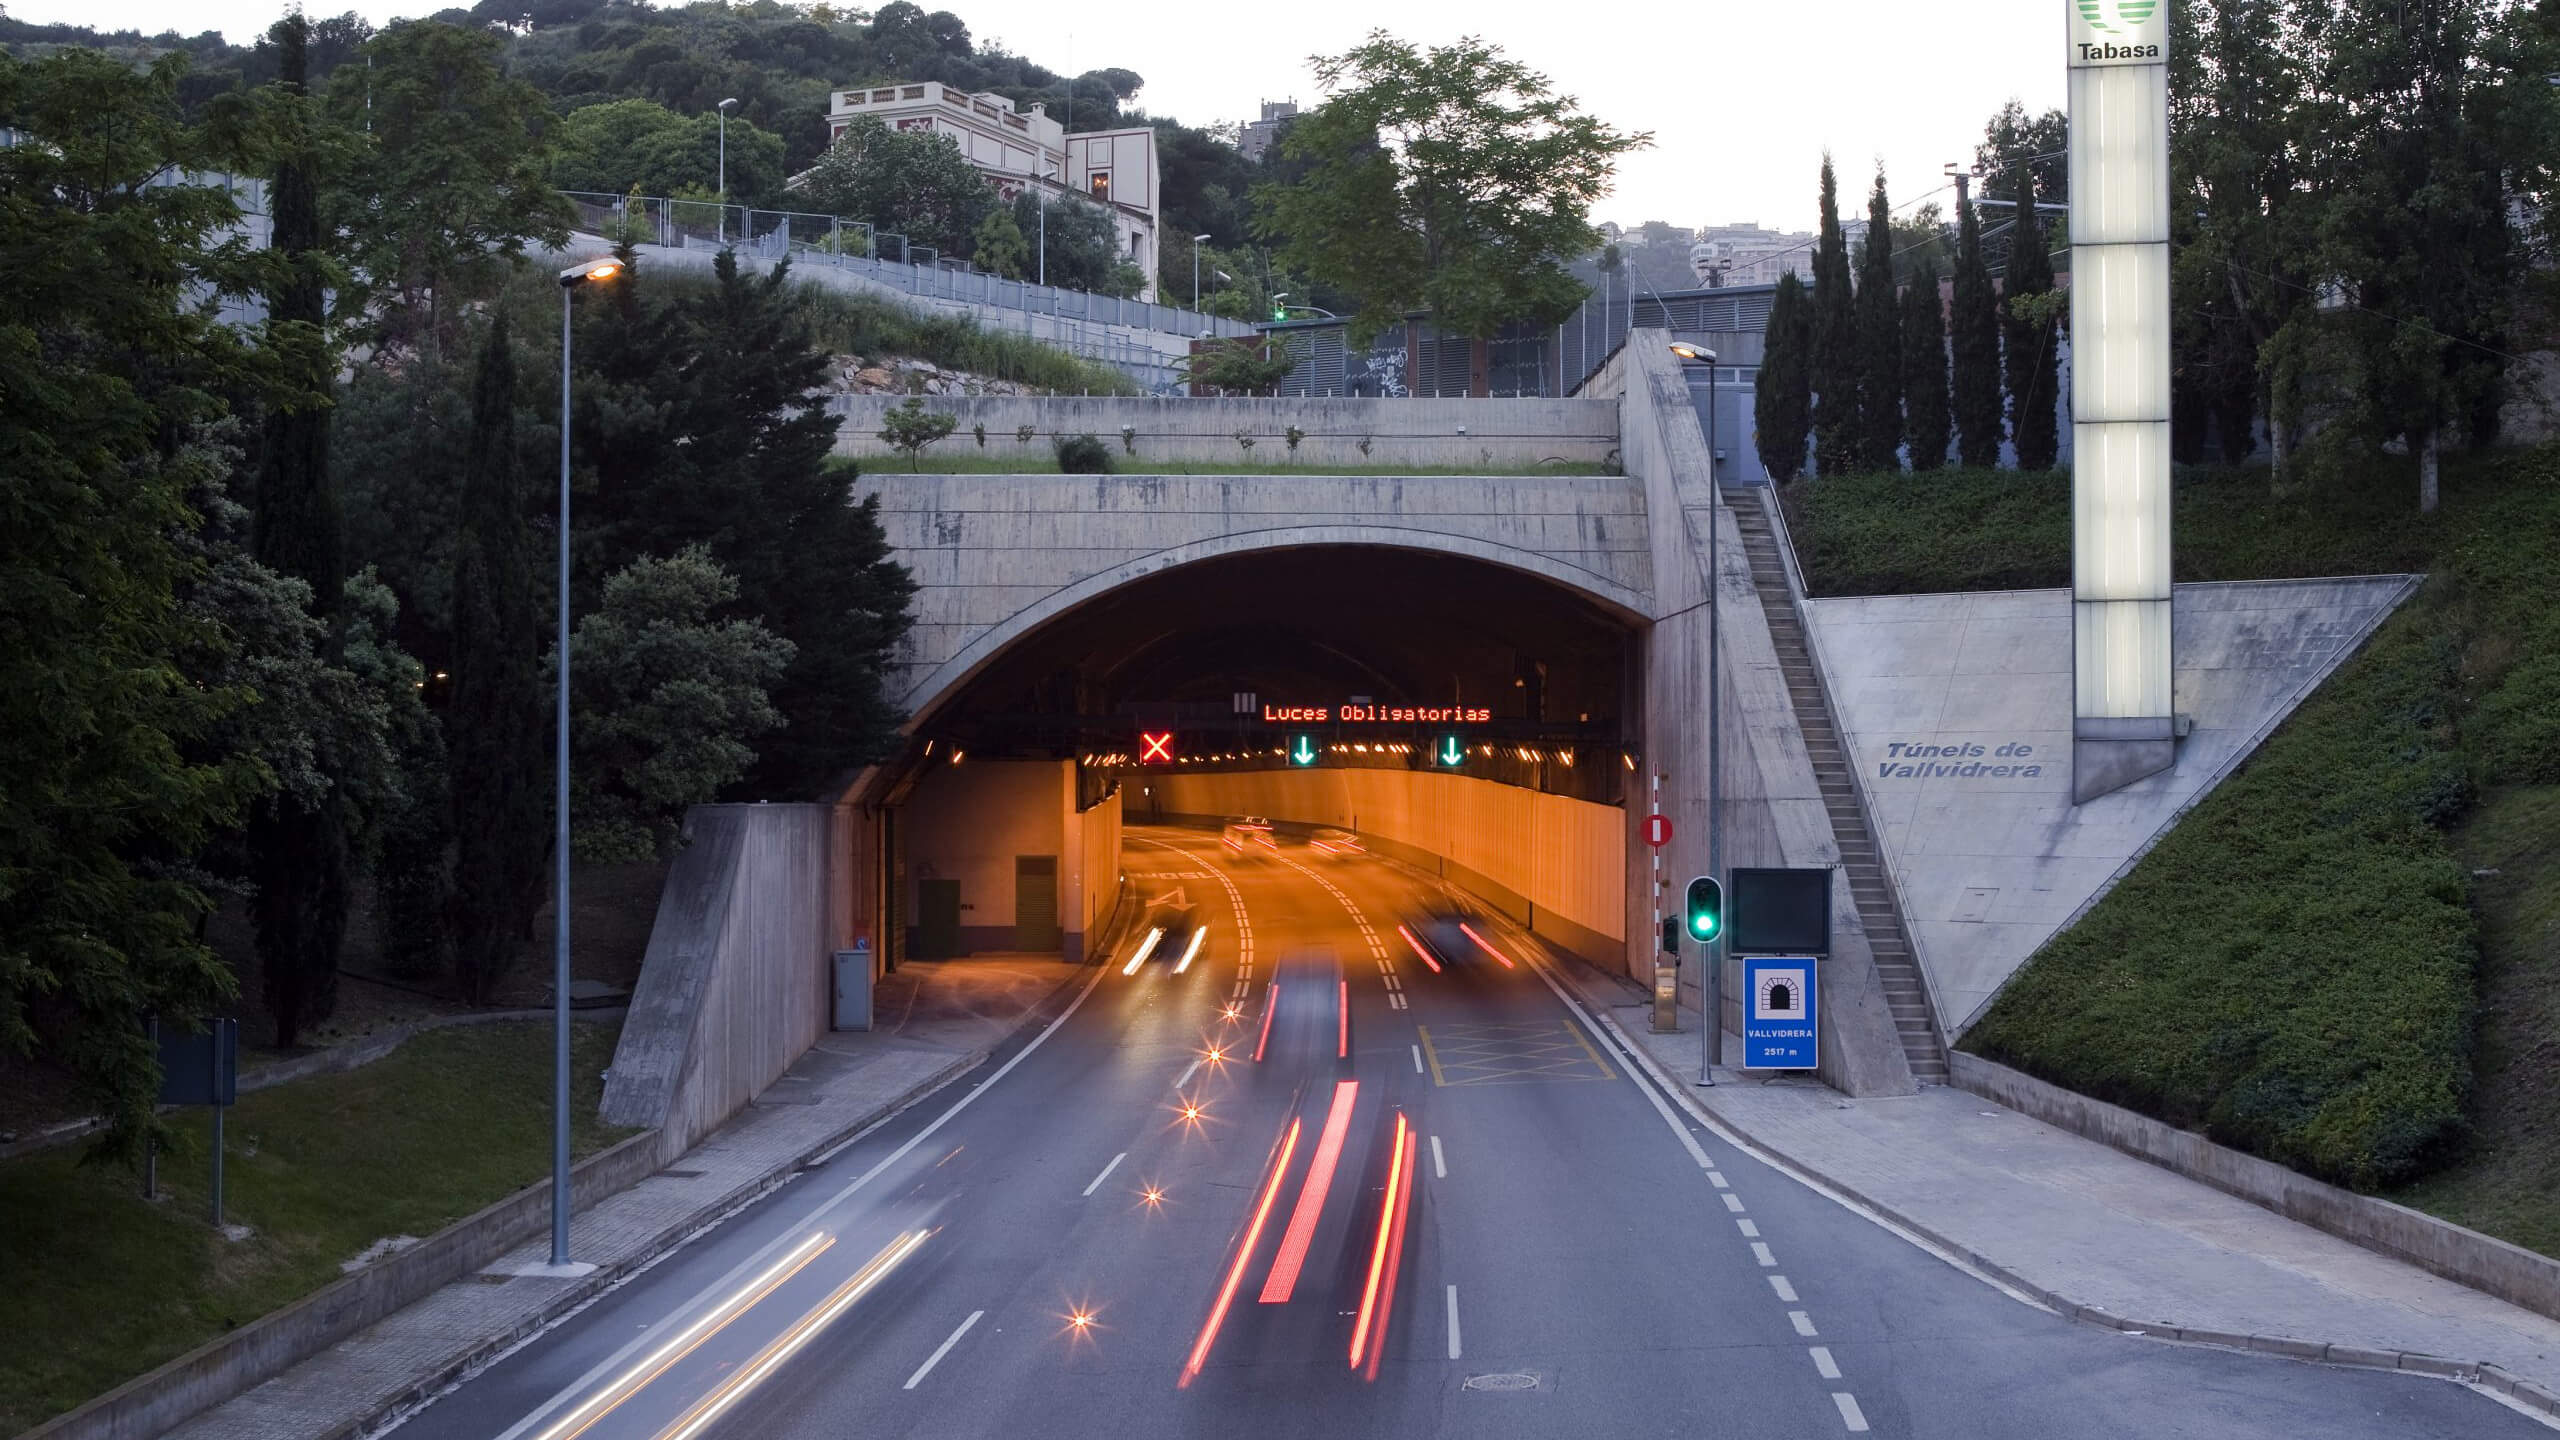 Túnels de Vallvidrera - entrada